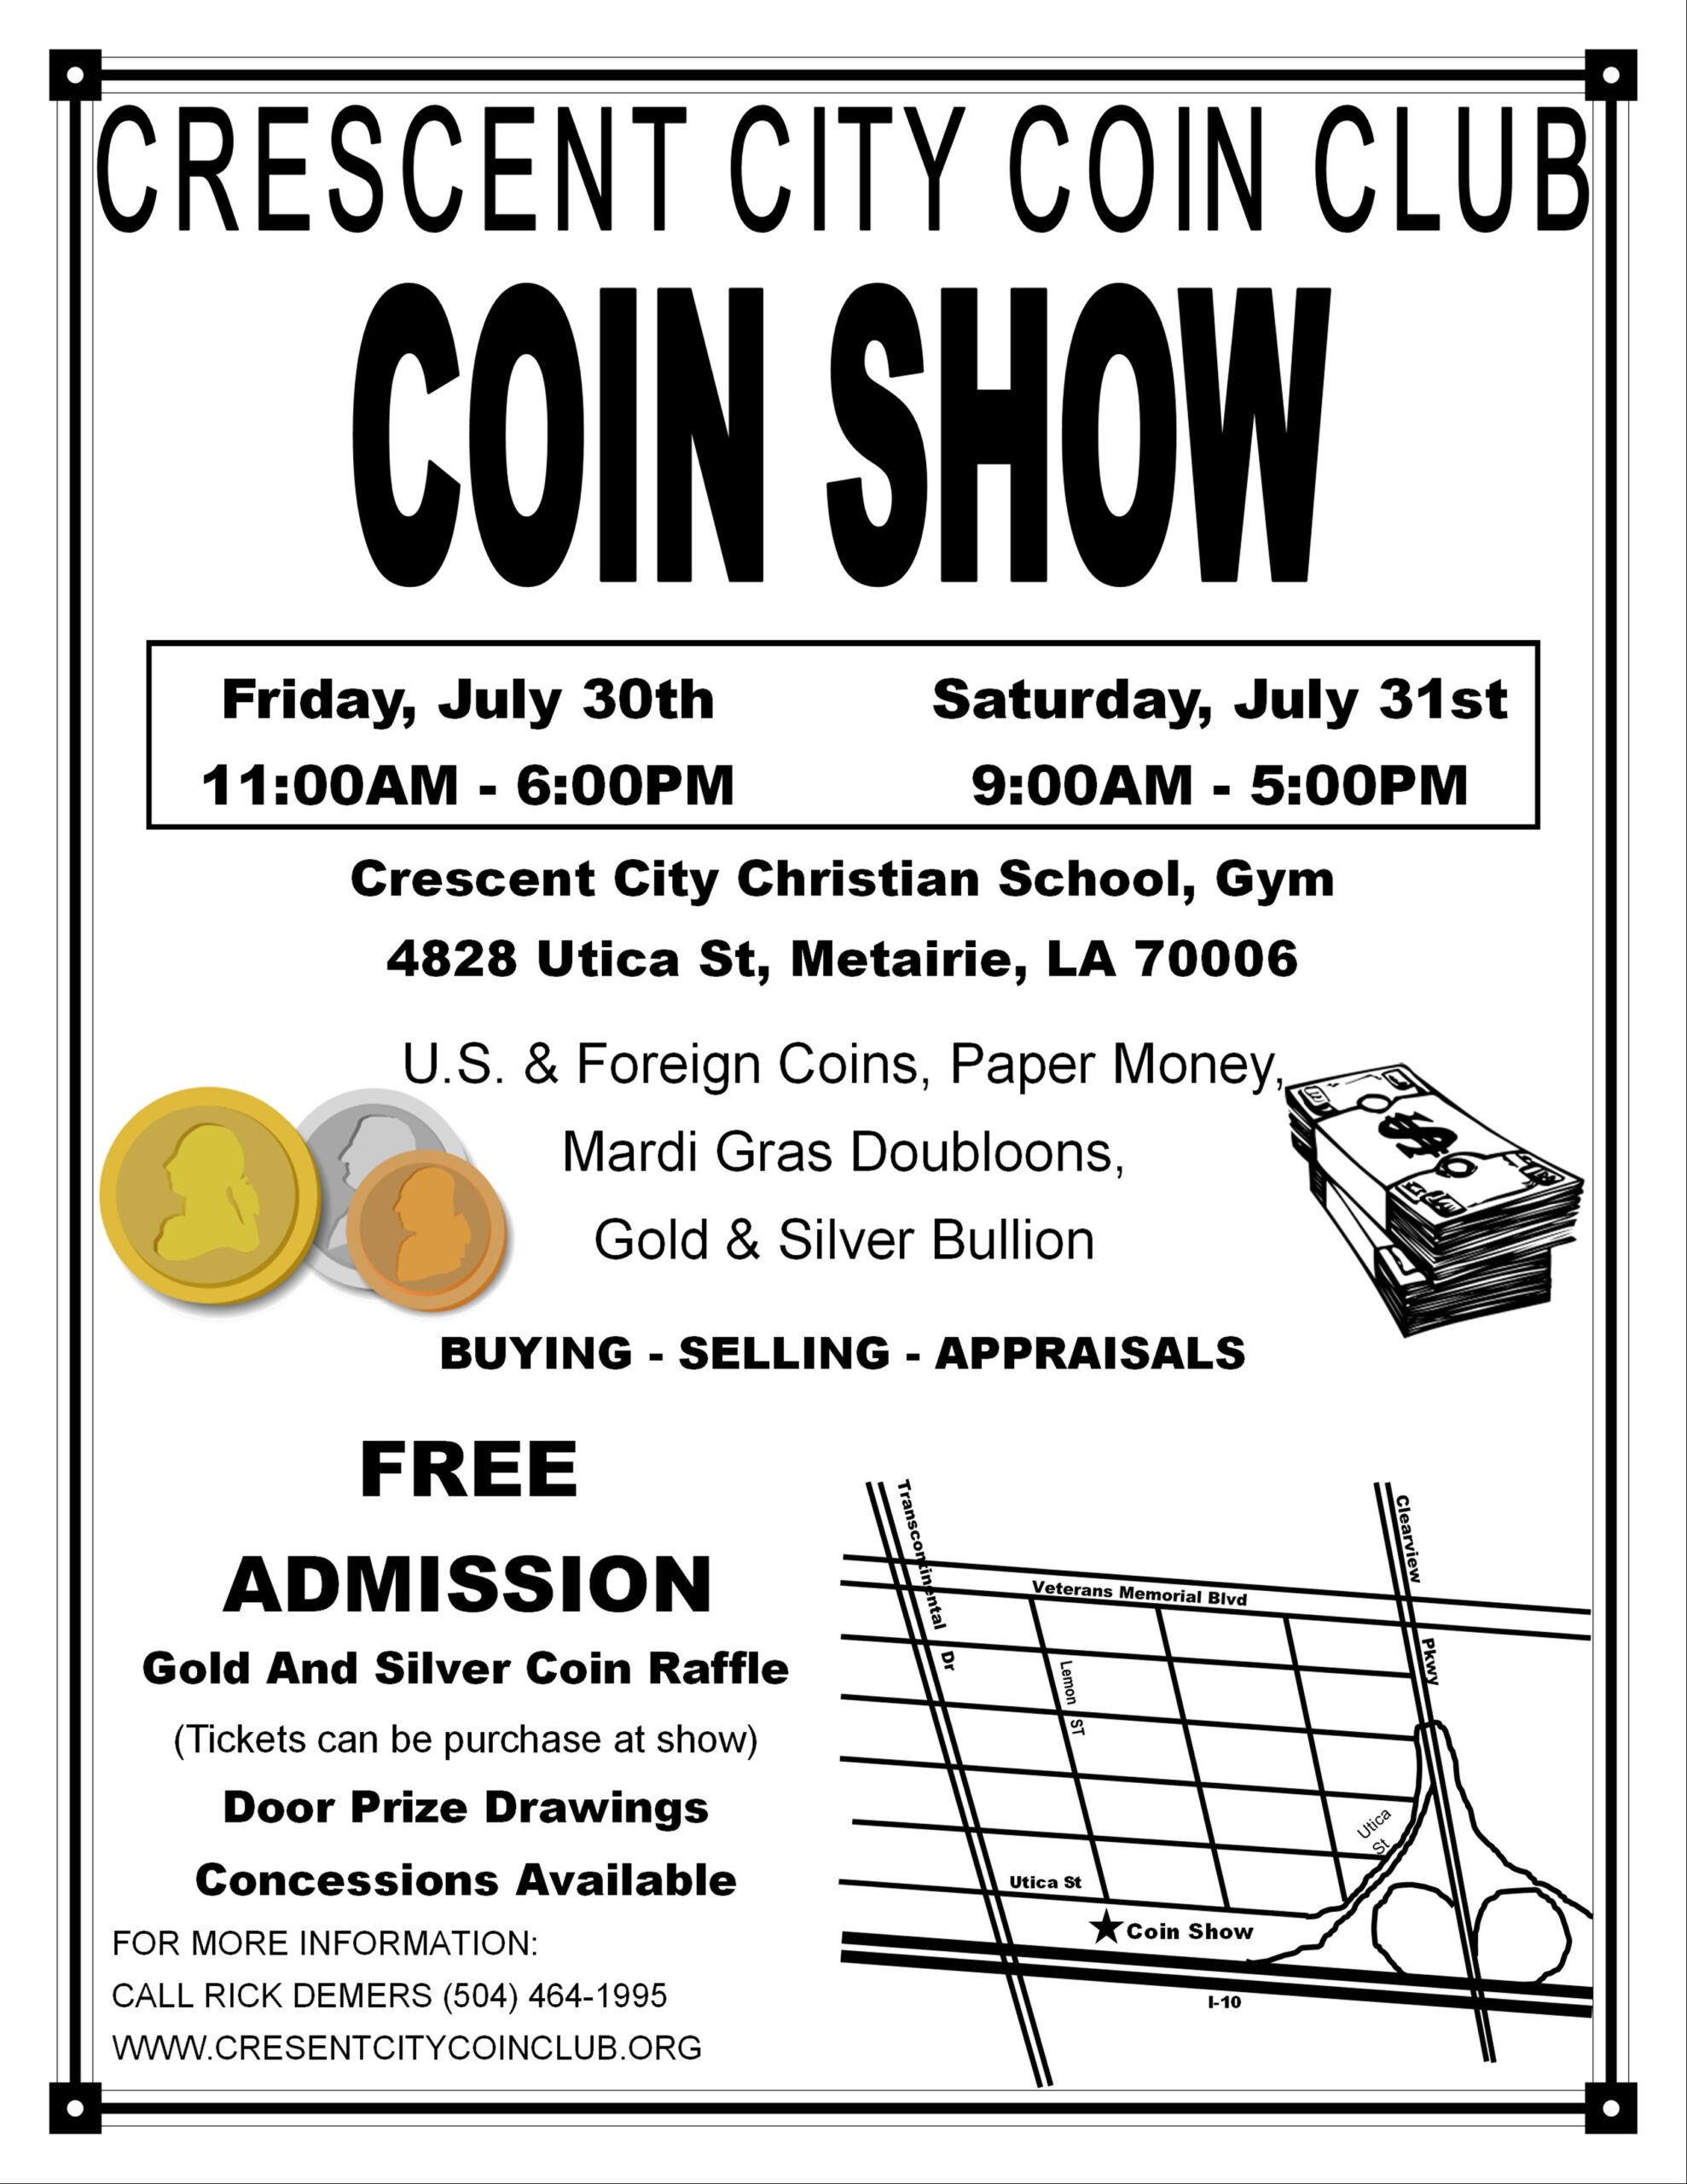 Crescent City Coin Club - Coin Show